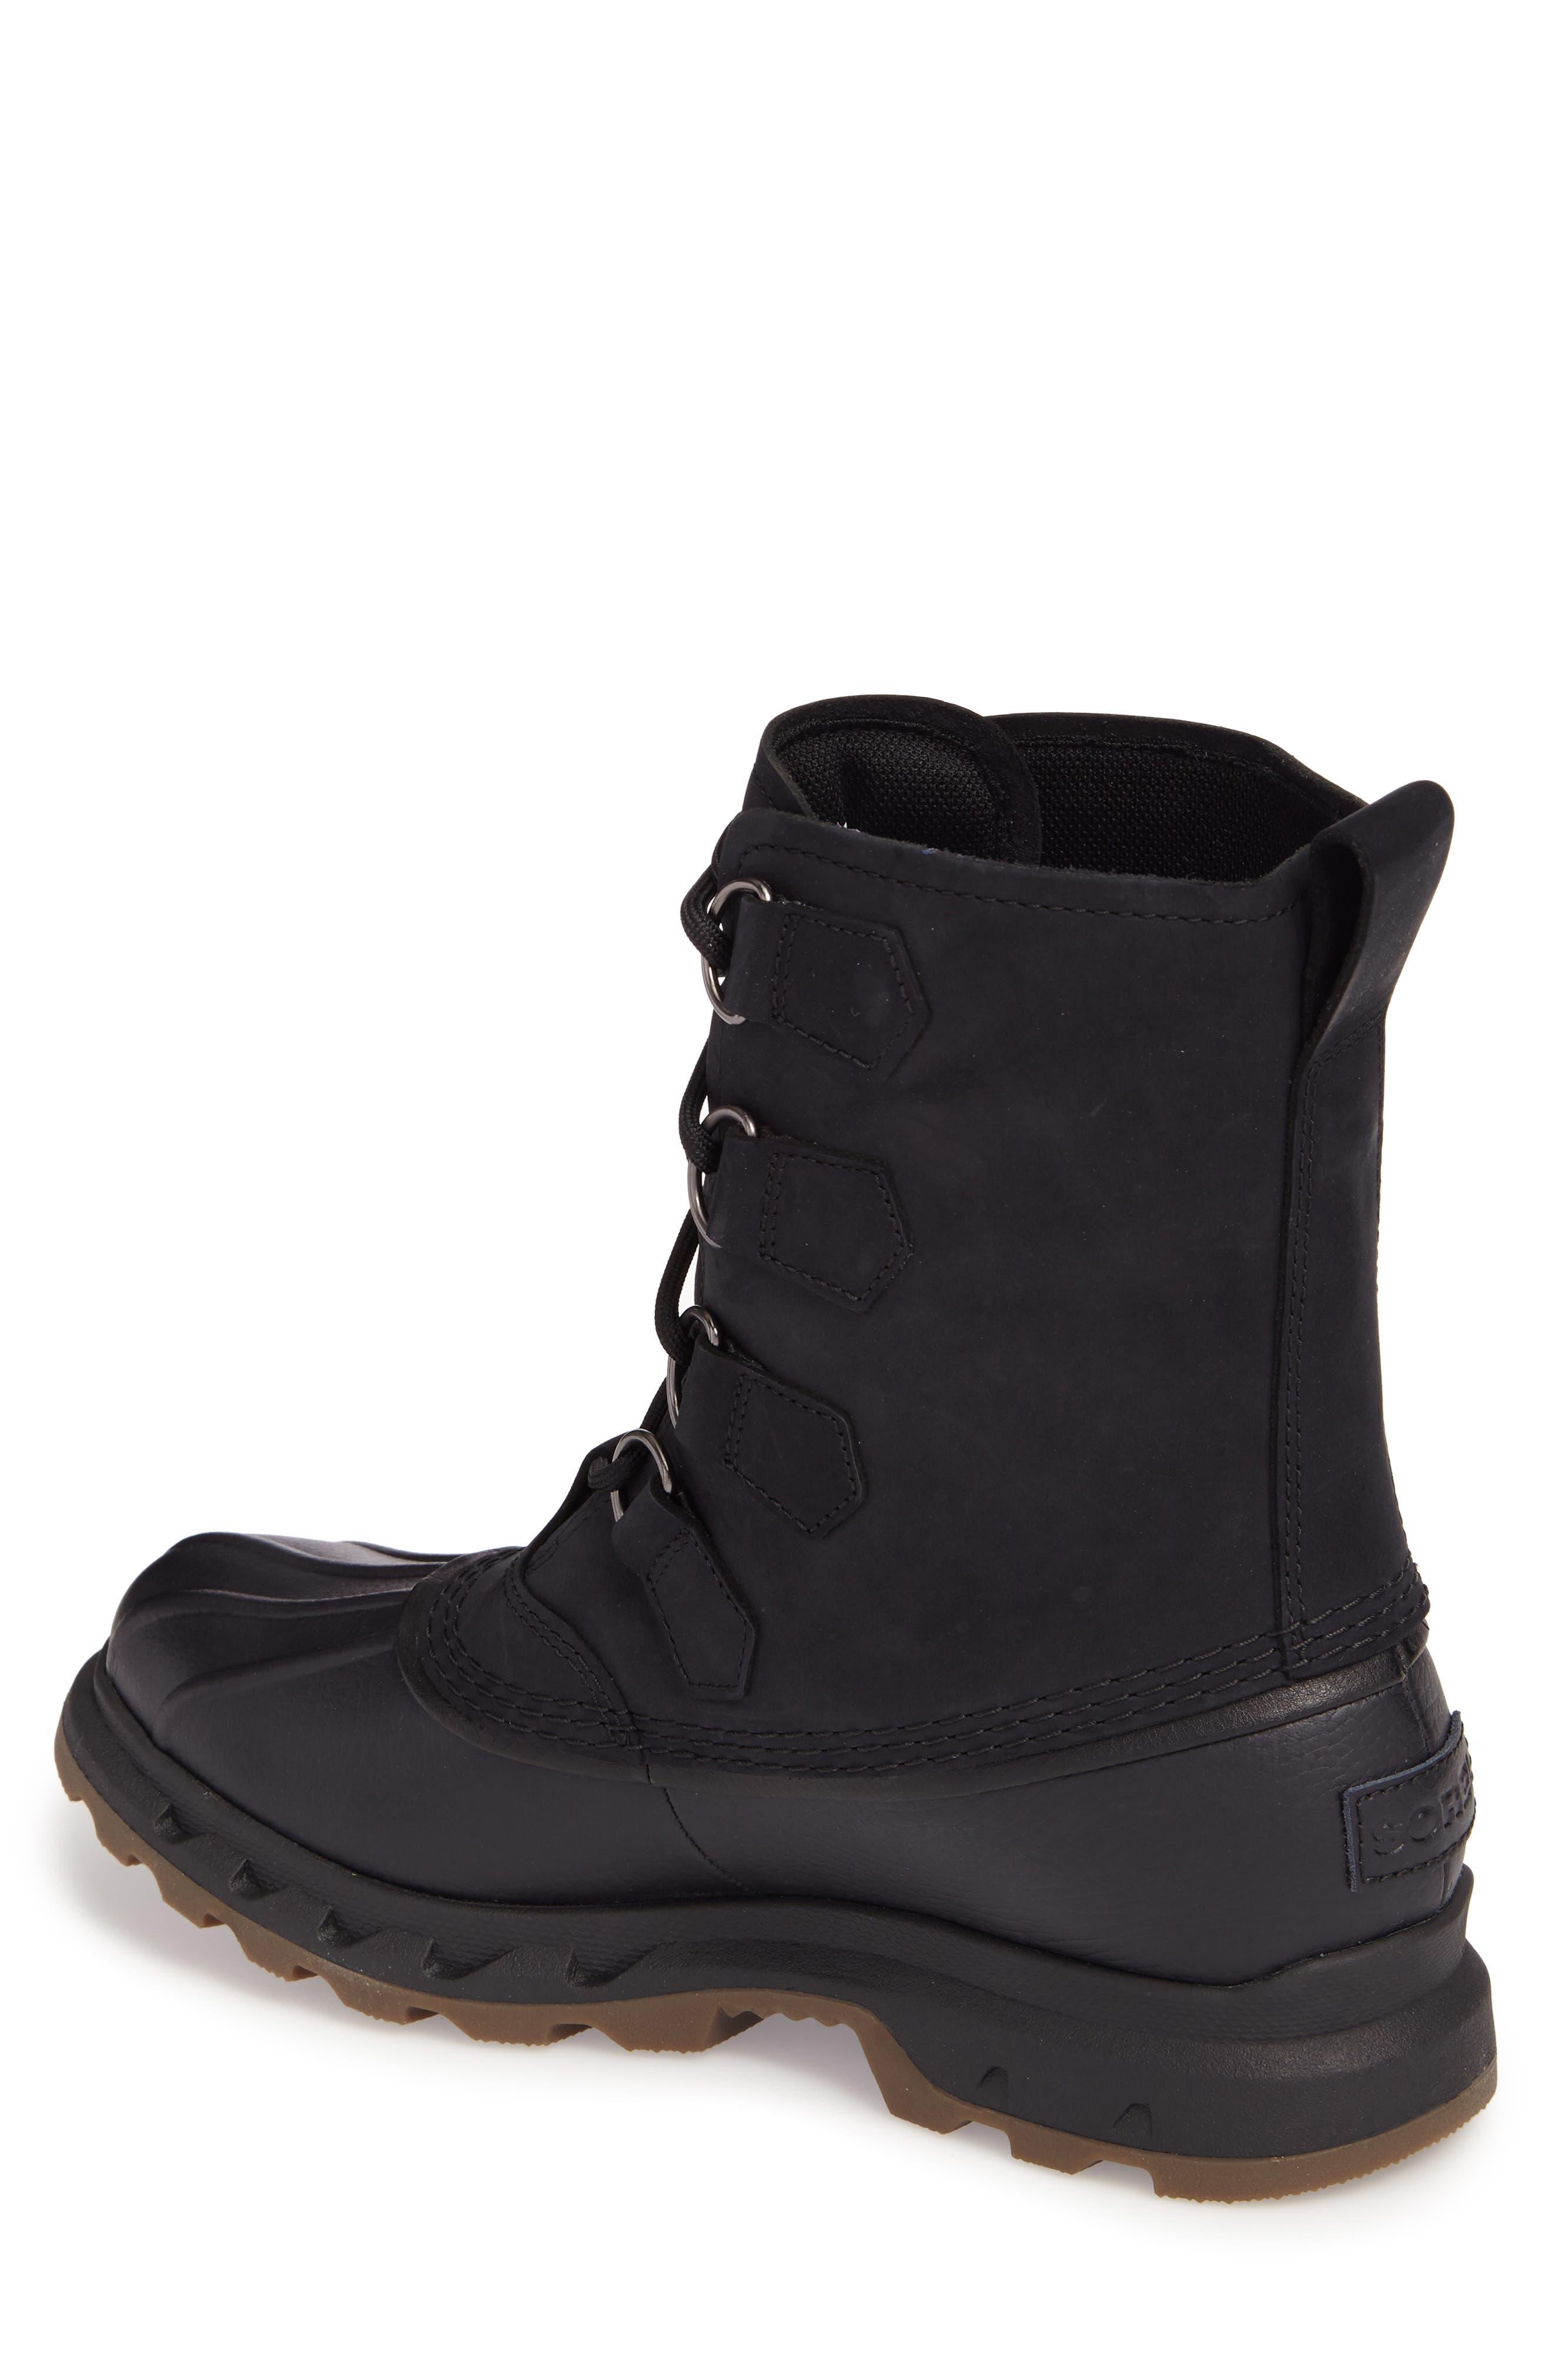 Alternate Image 2  - Sorel Portzman Classic Rain Boot (Men)